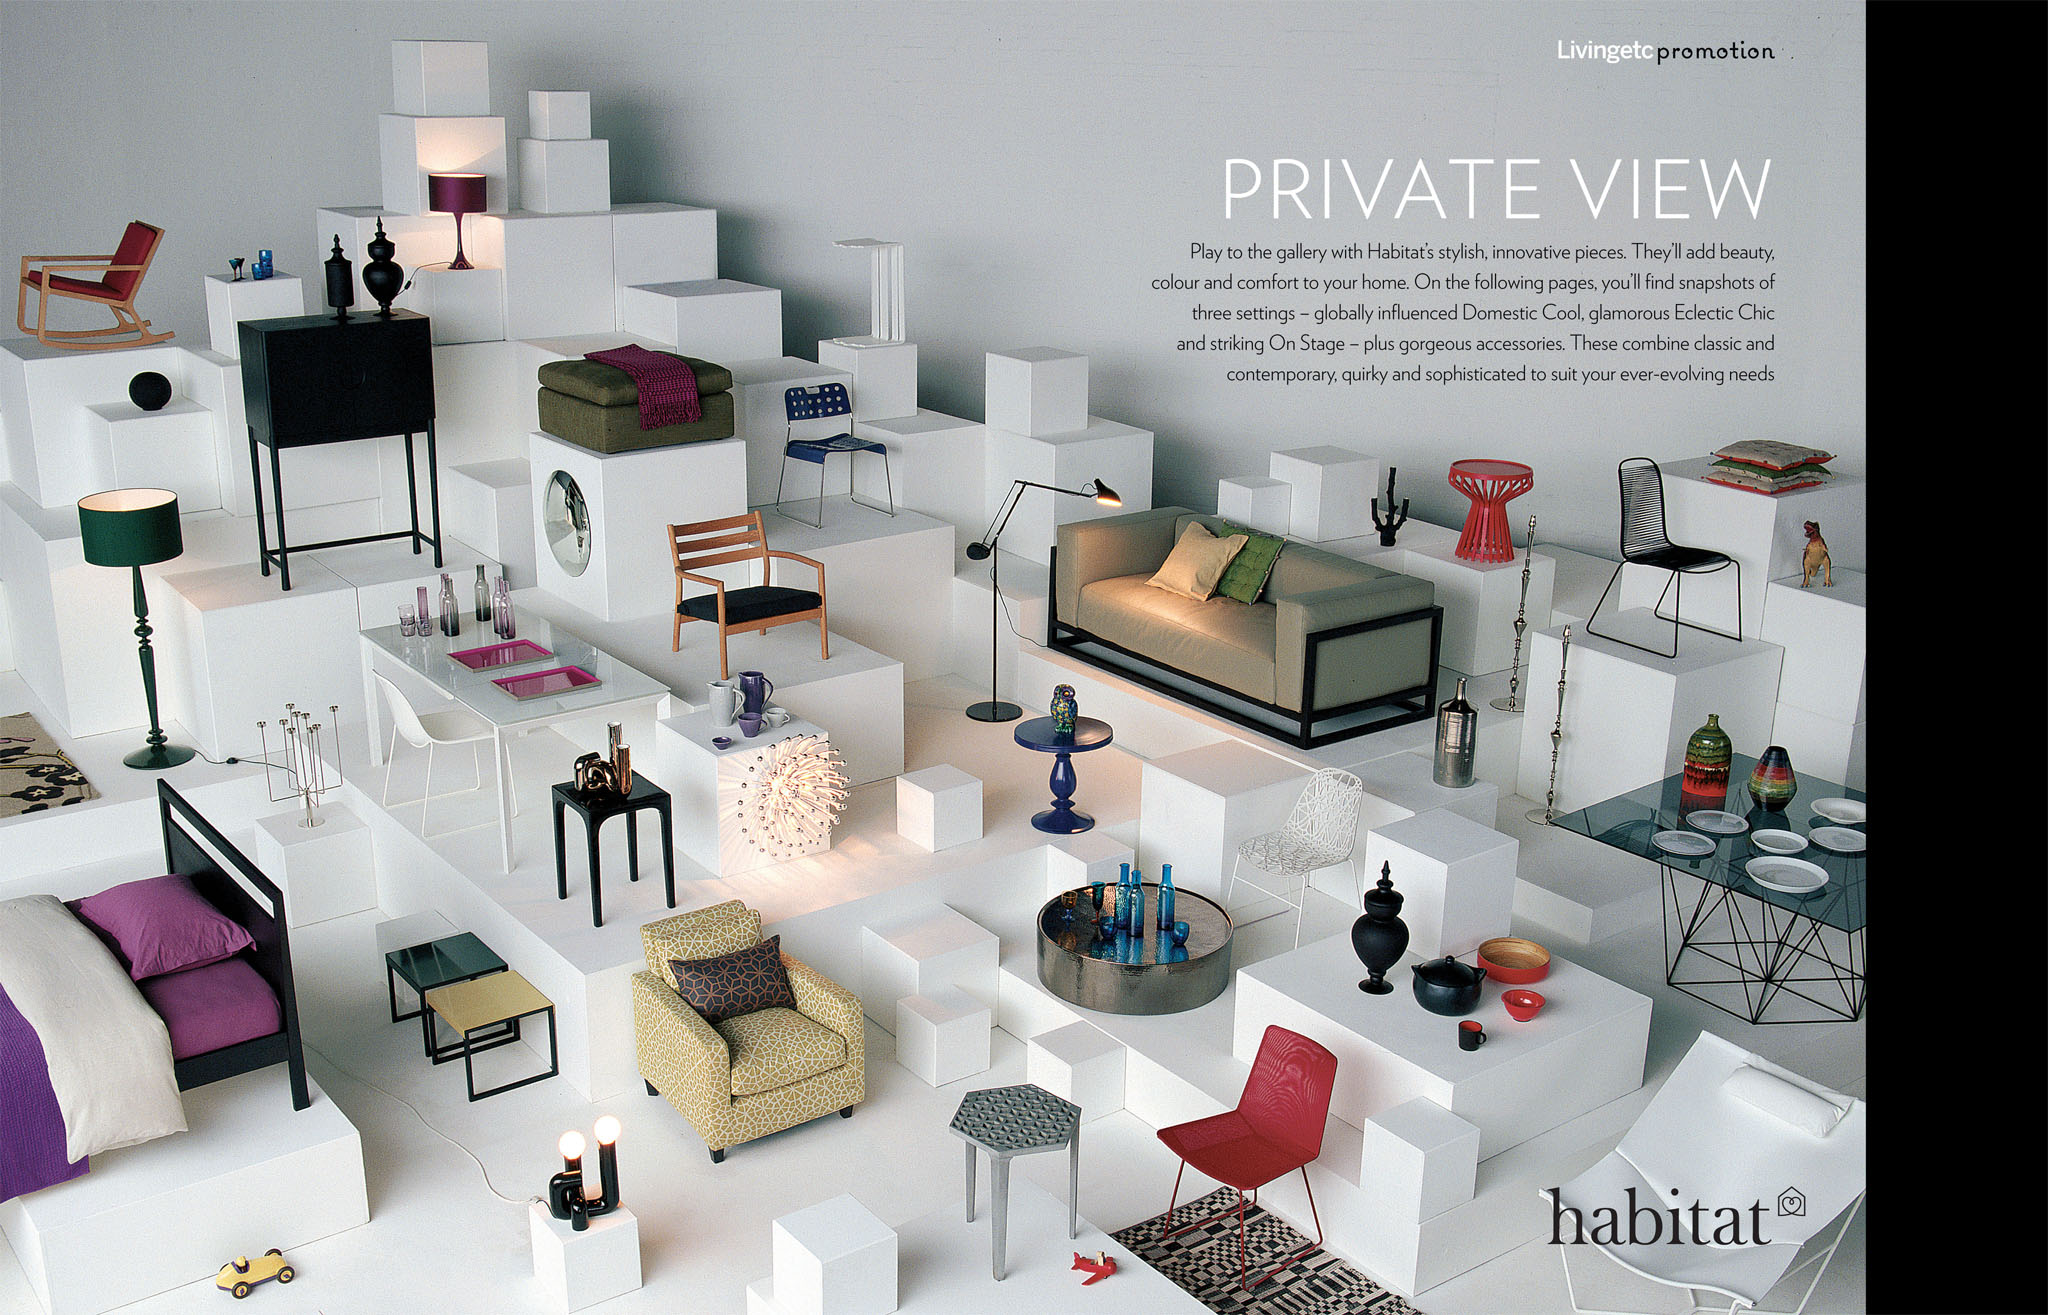 Habitat_LE_Sepv4.indd